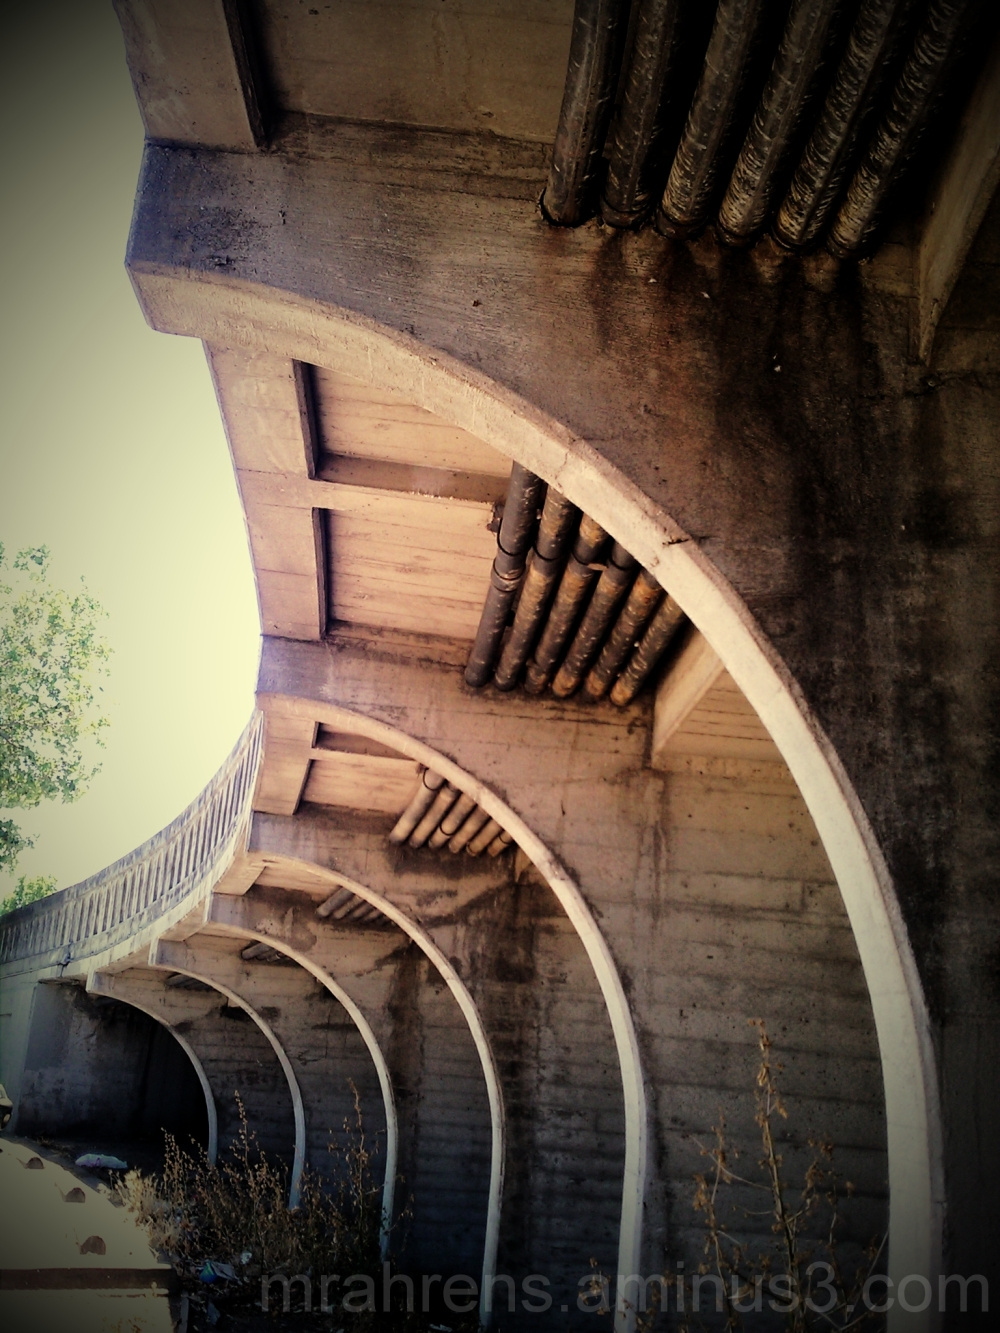 The Curvy Bridge